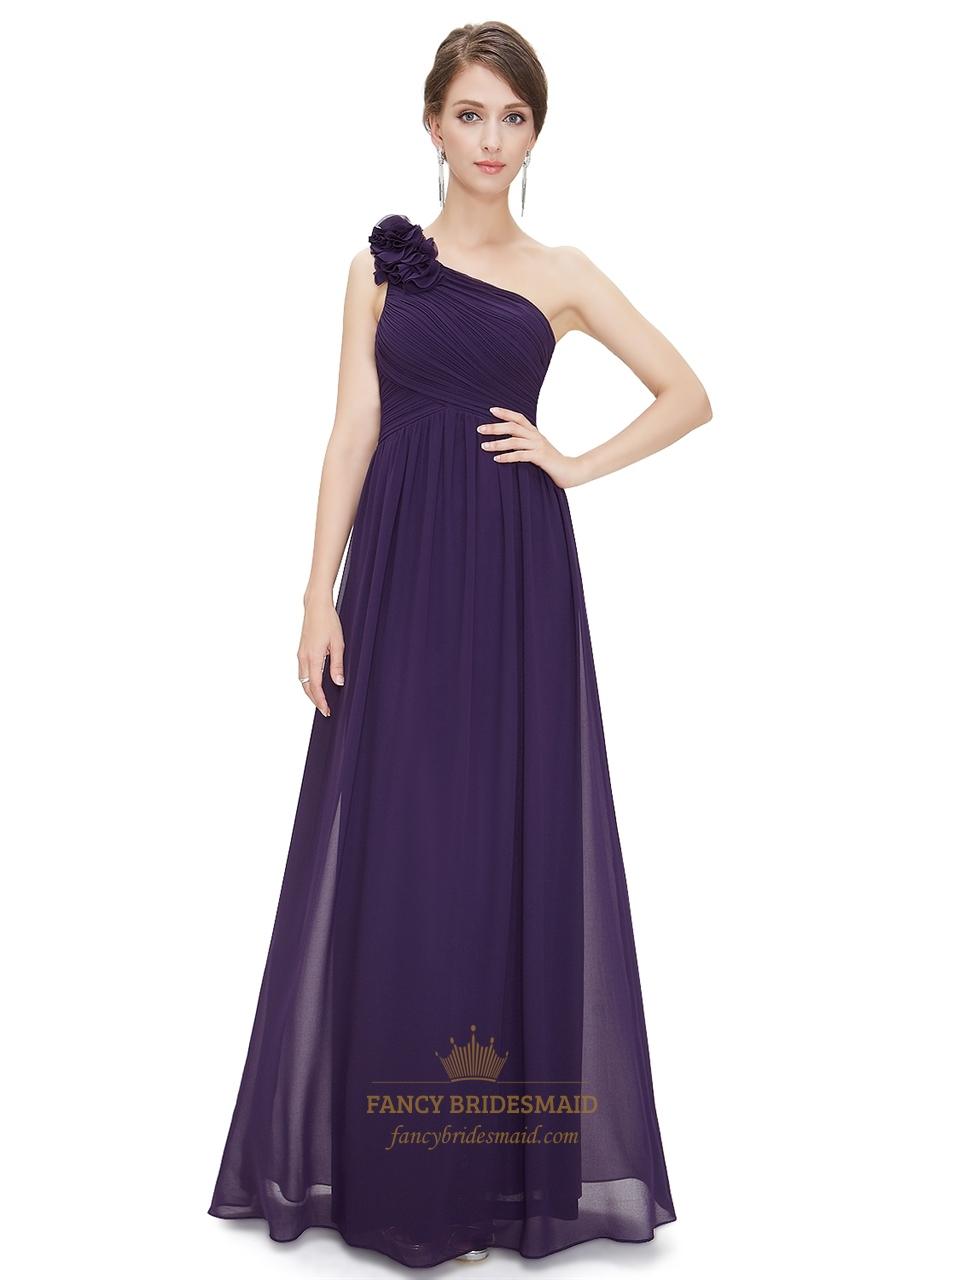 Lilac chiffon one shoulder bridesmaid dress with flower shoulder lilac chiffon one shoulder bridesmaid dress with flower shoulder strap ombrellifo Gallery